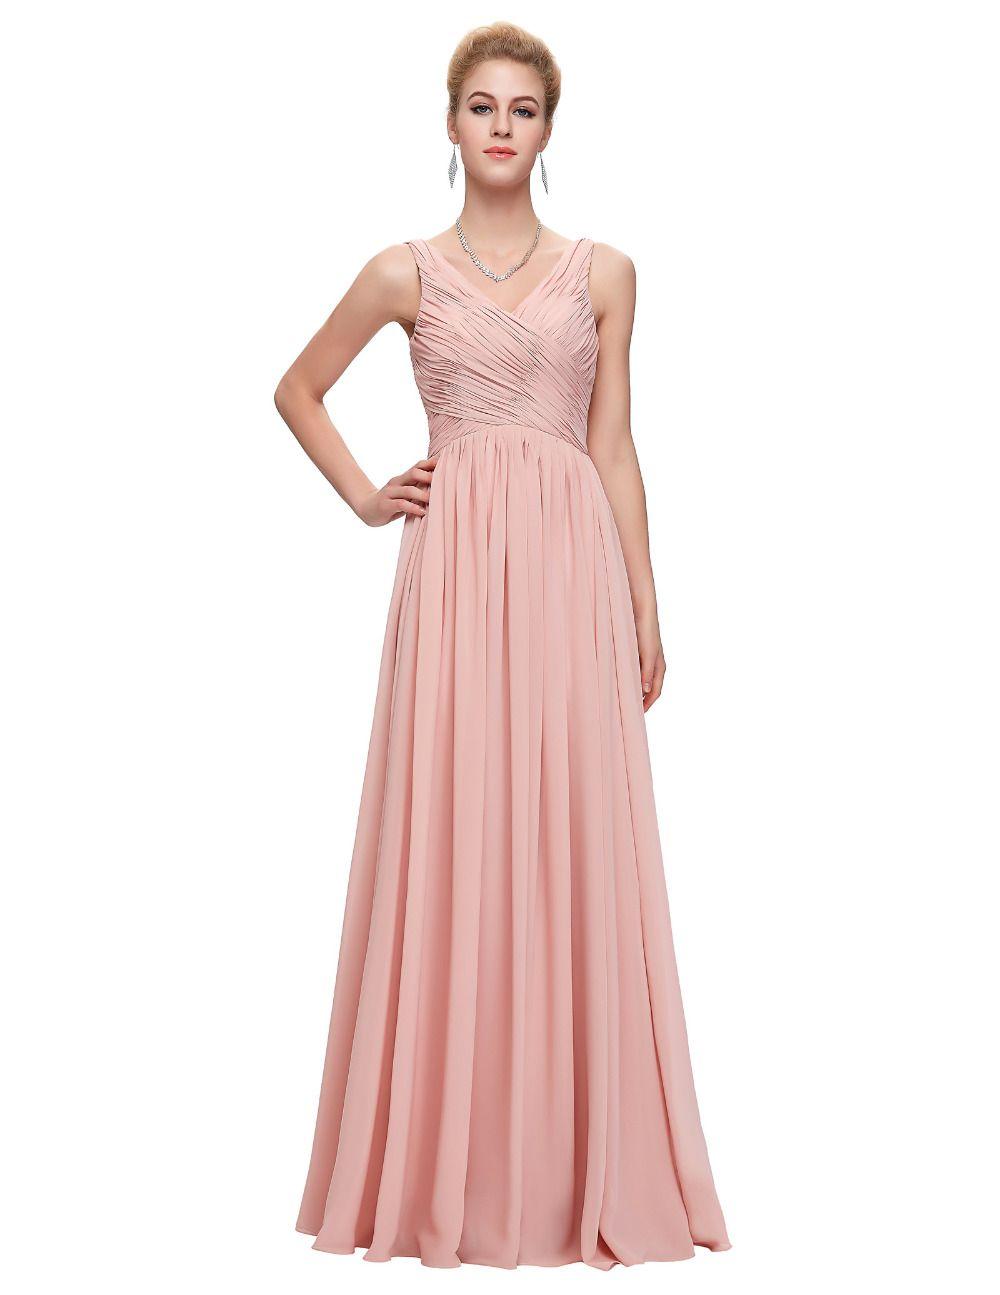 Elegant Pink Evening Dress Prom Dresses 2017 Coral Purple Green Blue ...